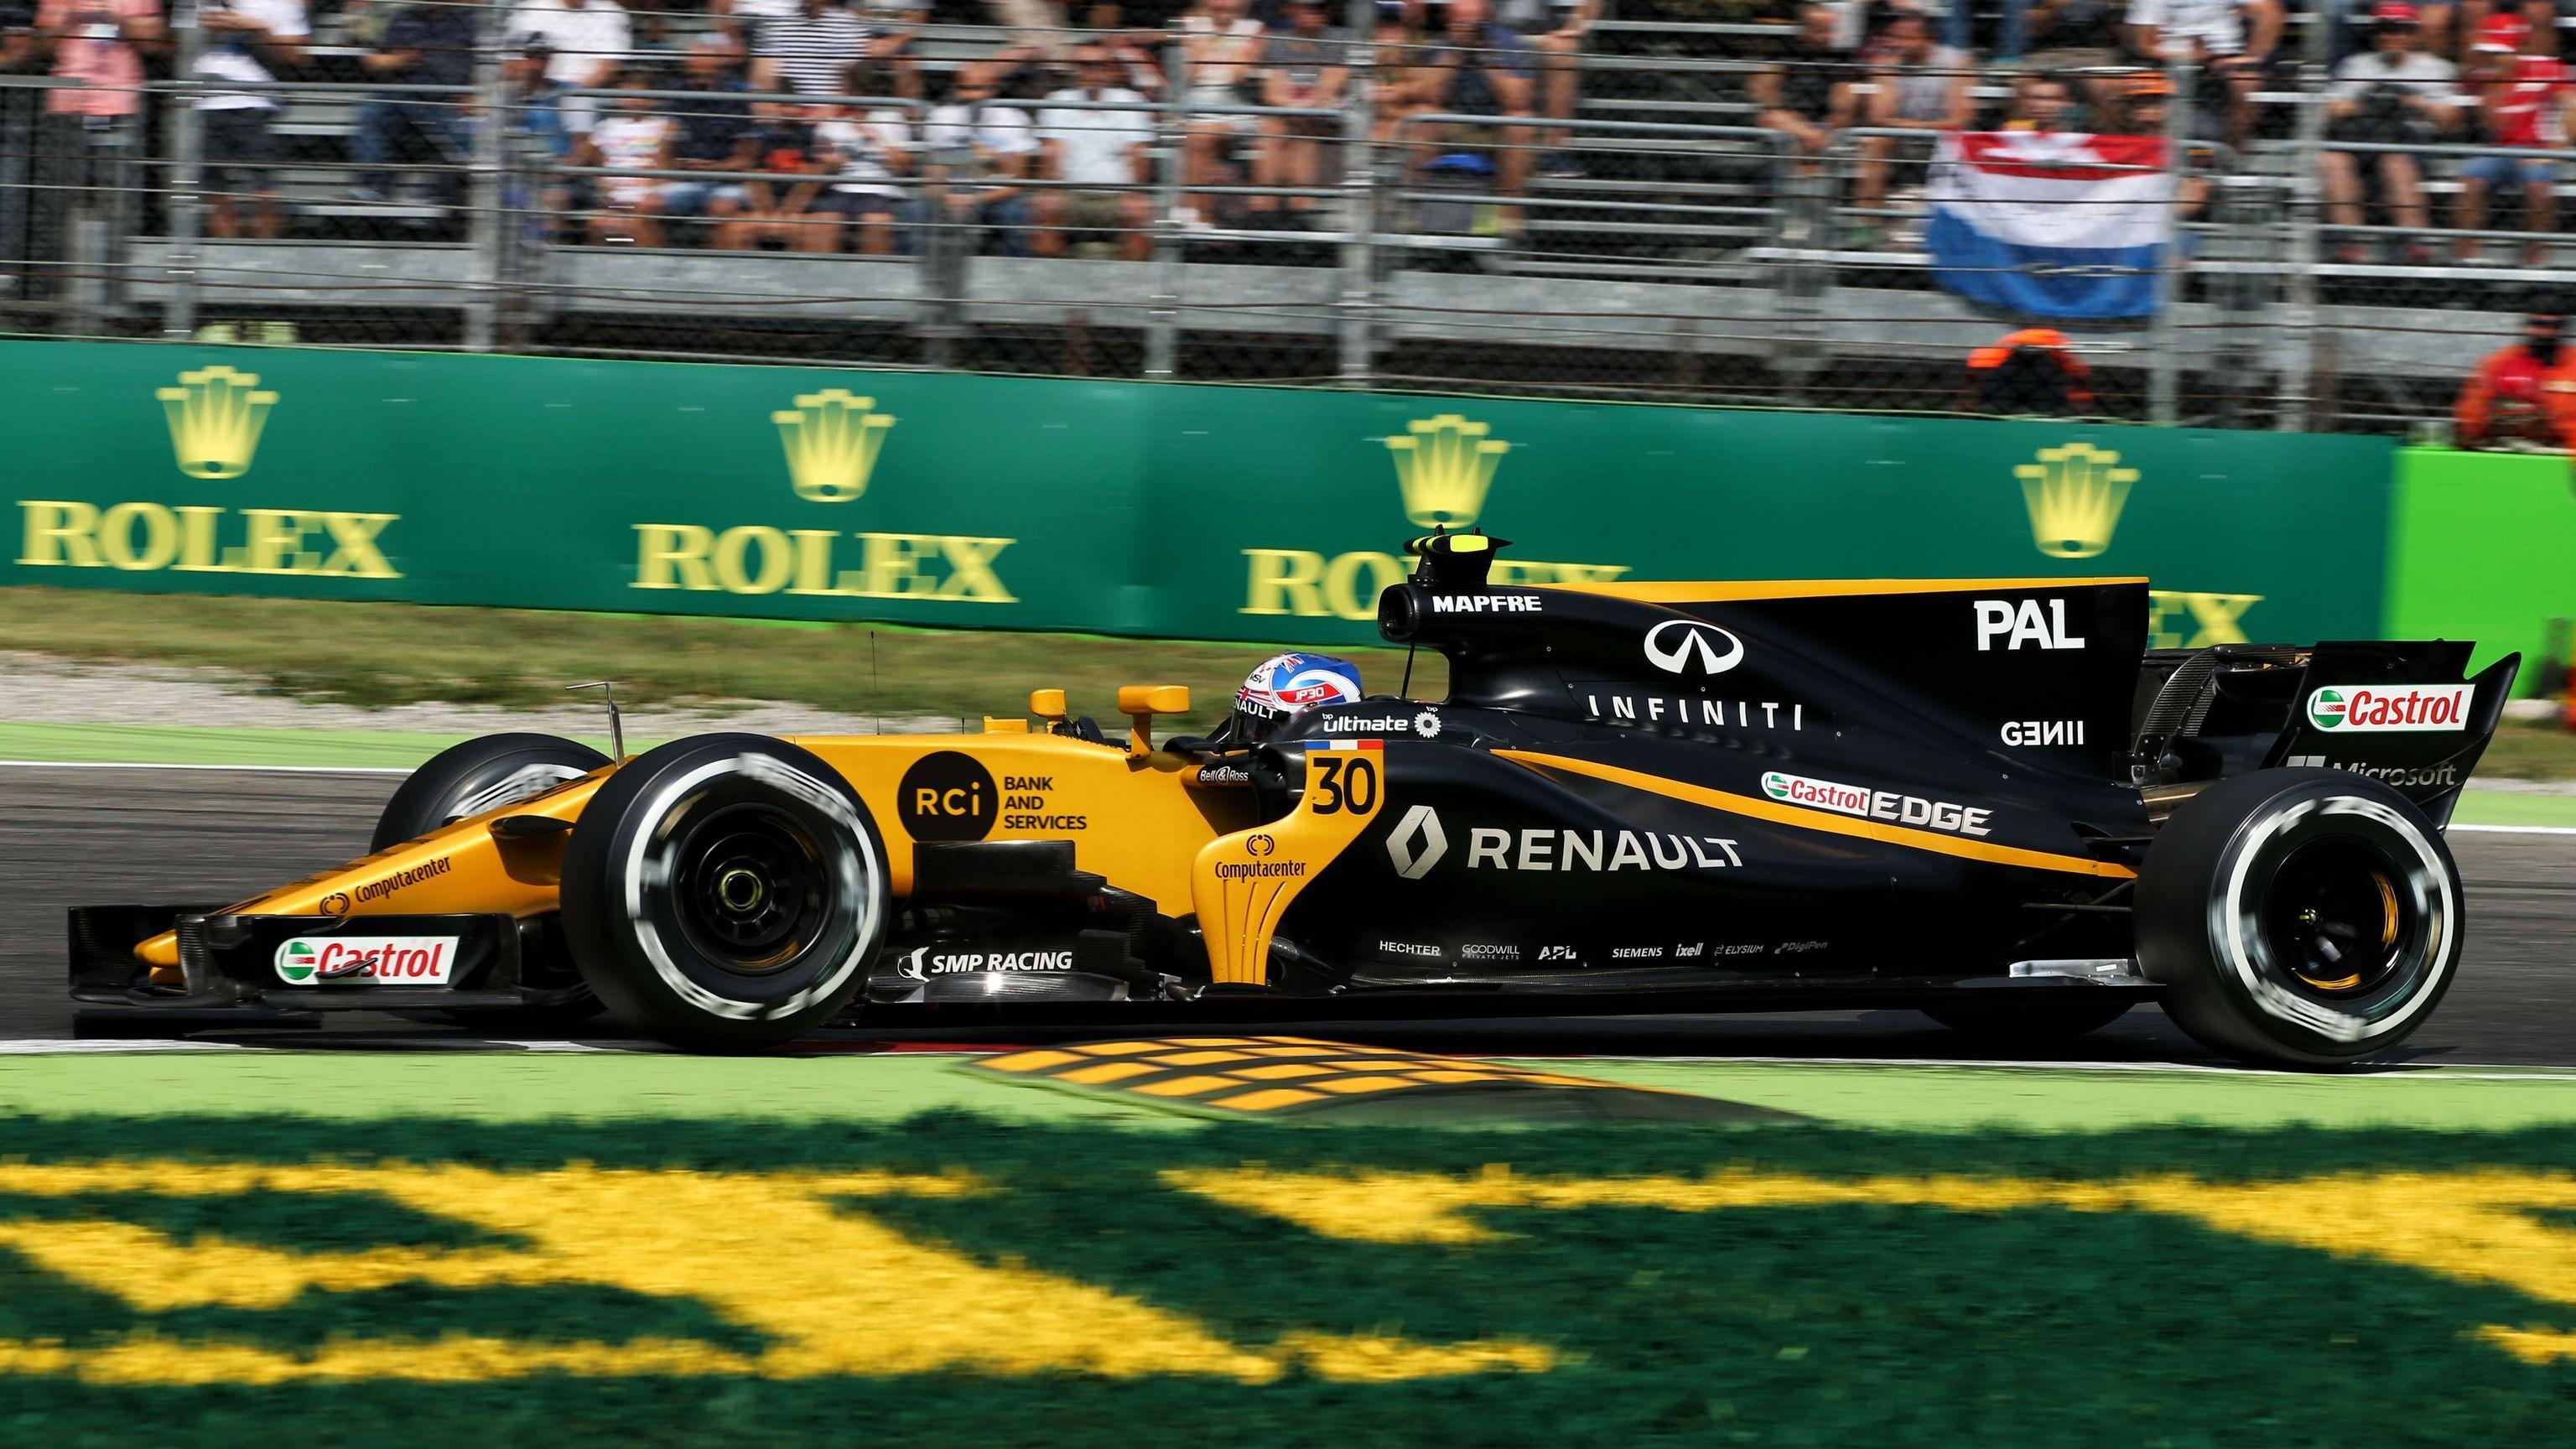 Команда Renault Sport Формула-1 объявила о начале партнерства с RCI bank and Services